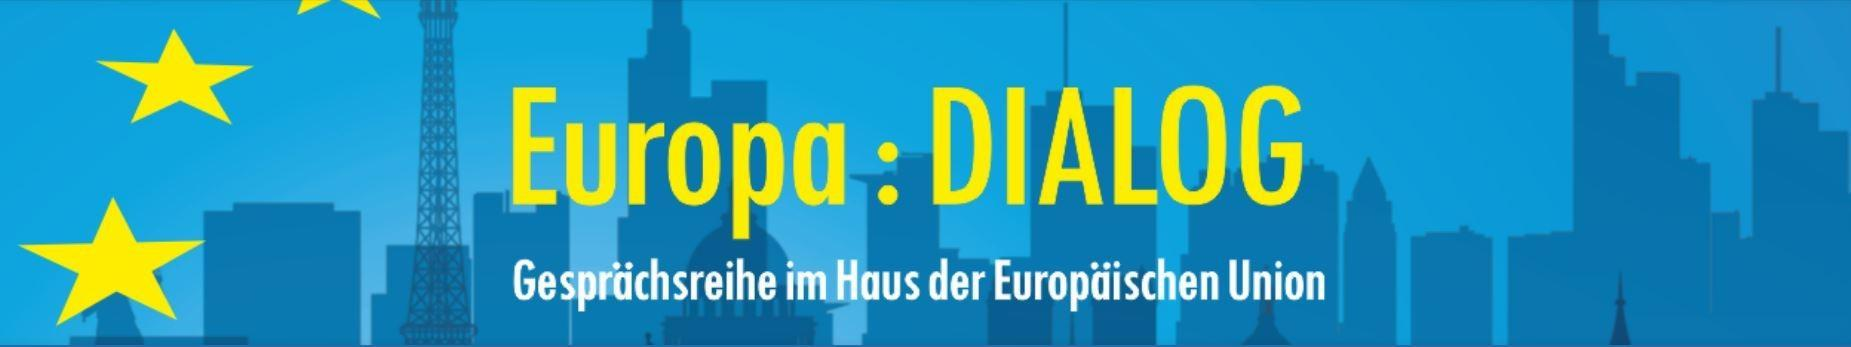 Europa im Dialog Logo ©www.europainfo.at